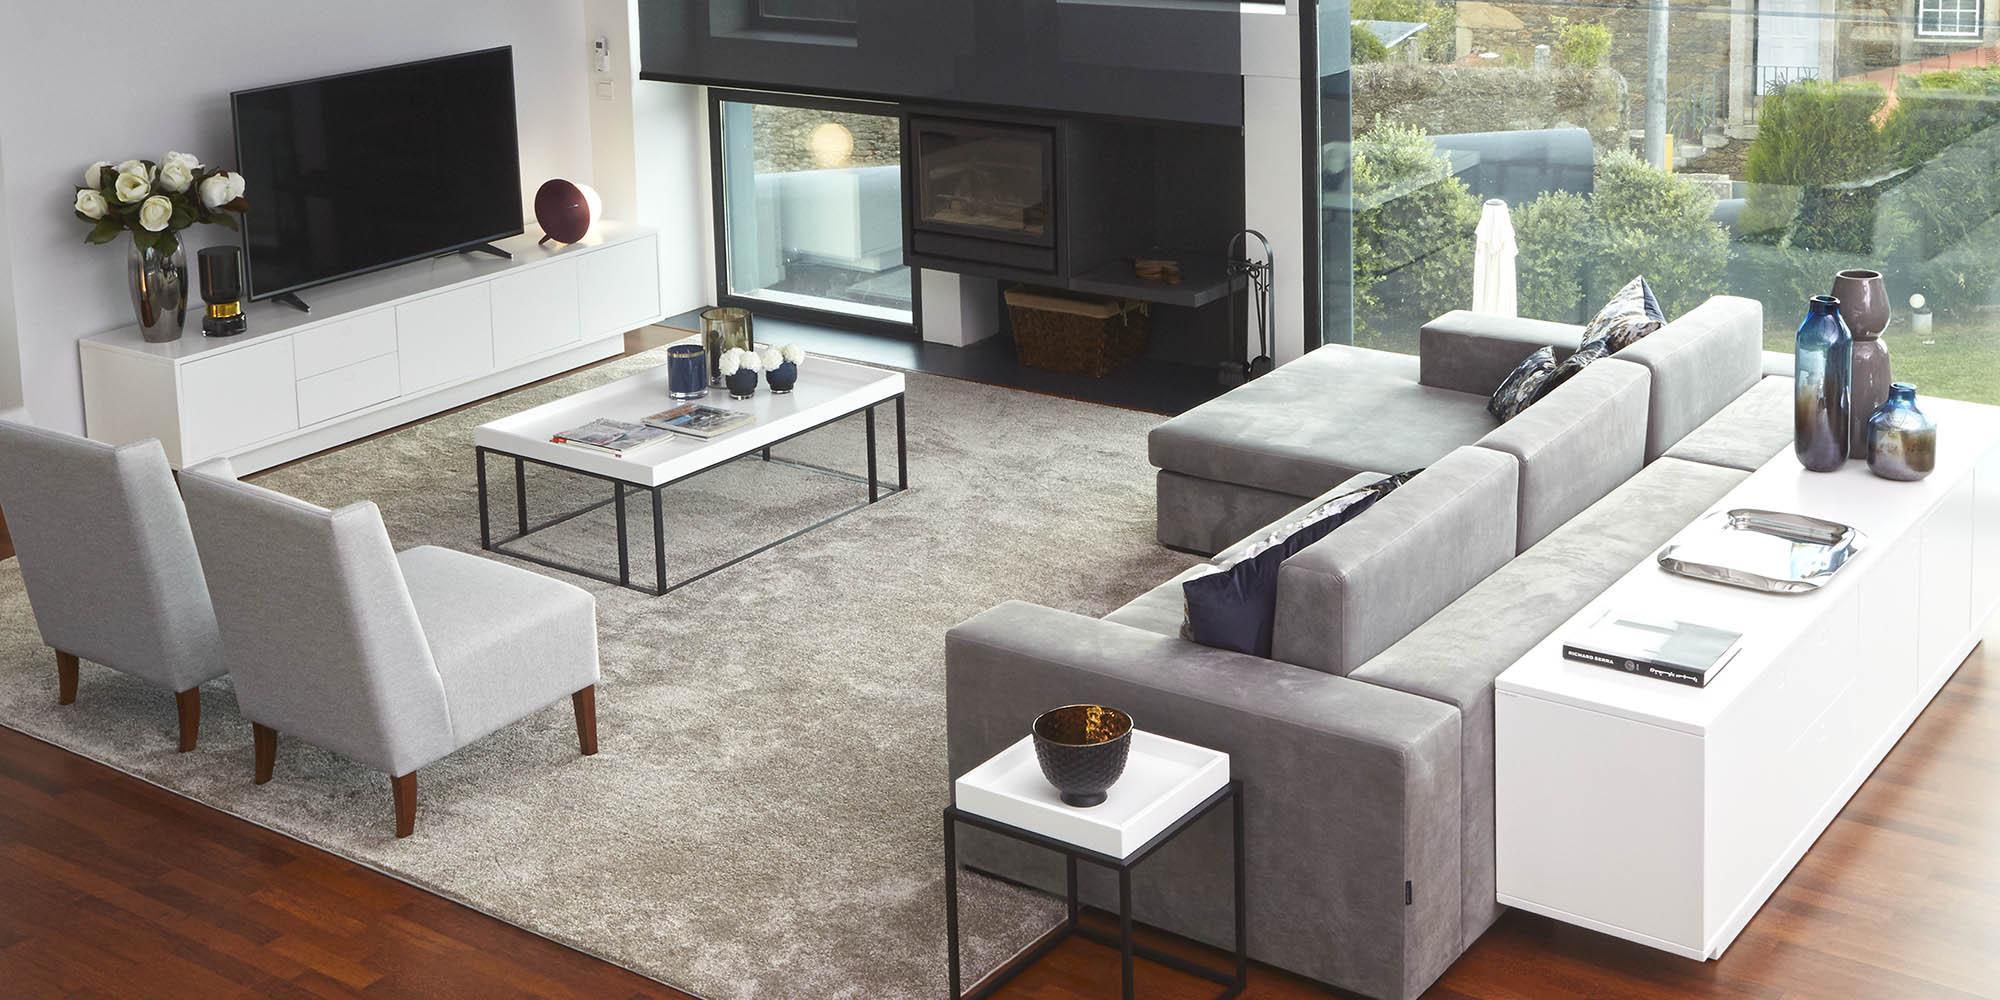 moradia-decoracao-camas-estofas-sofa-cinza-moveis-brancos